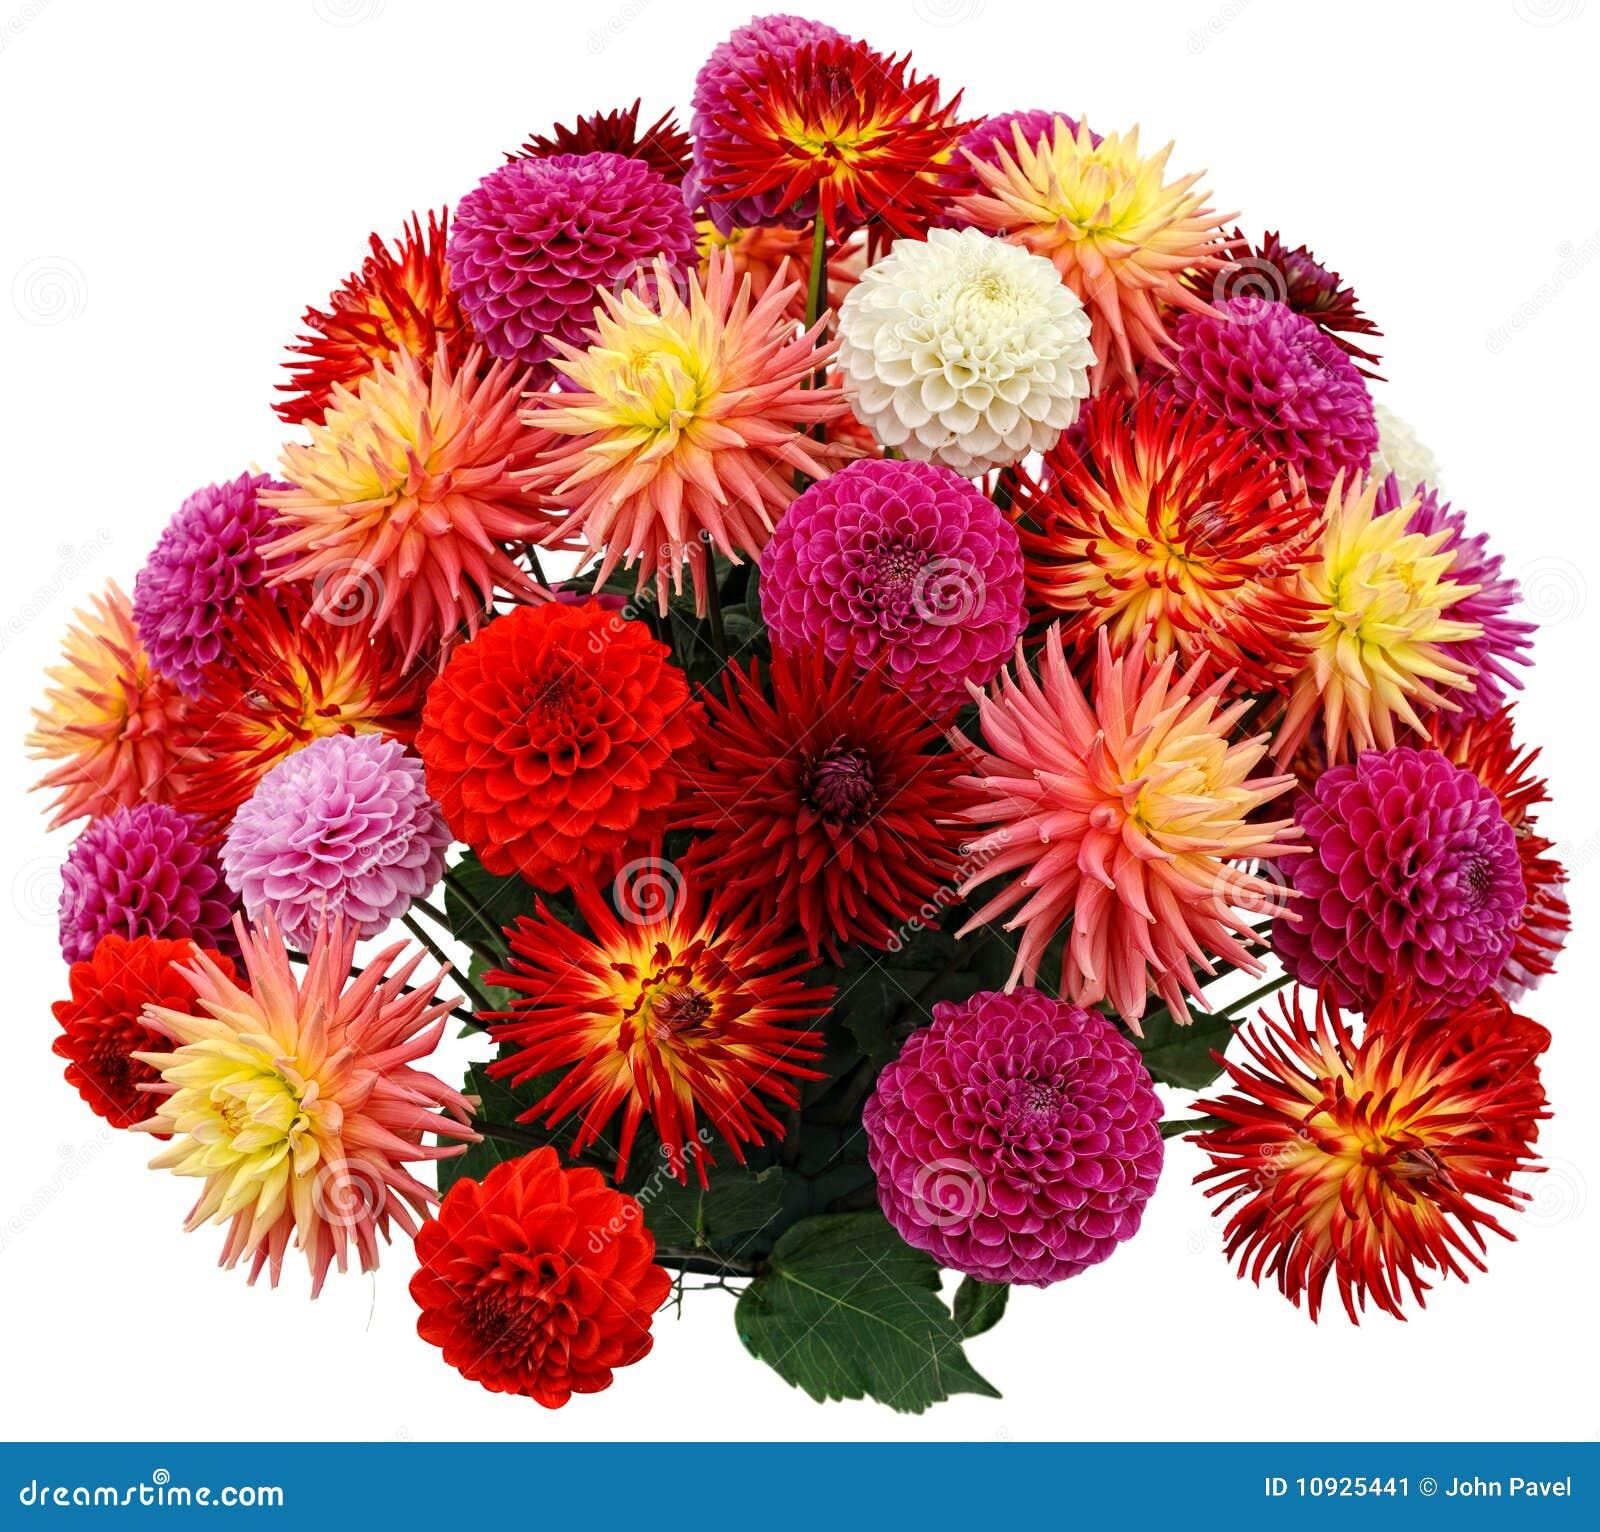 Dahlia Flower Arrangements